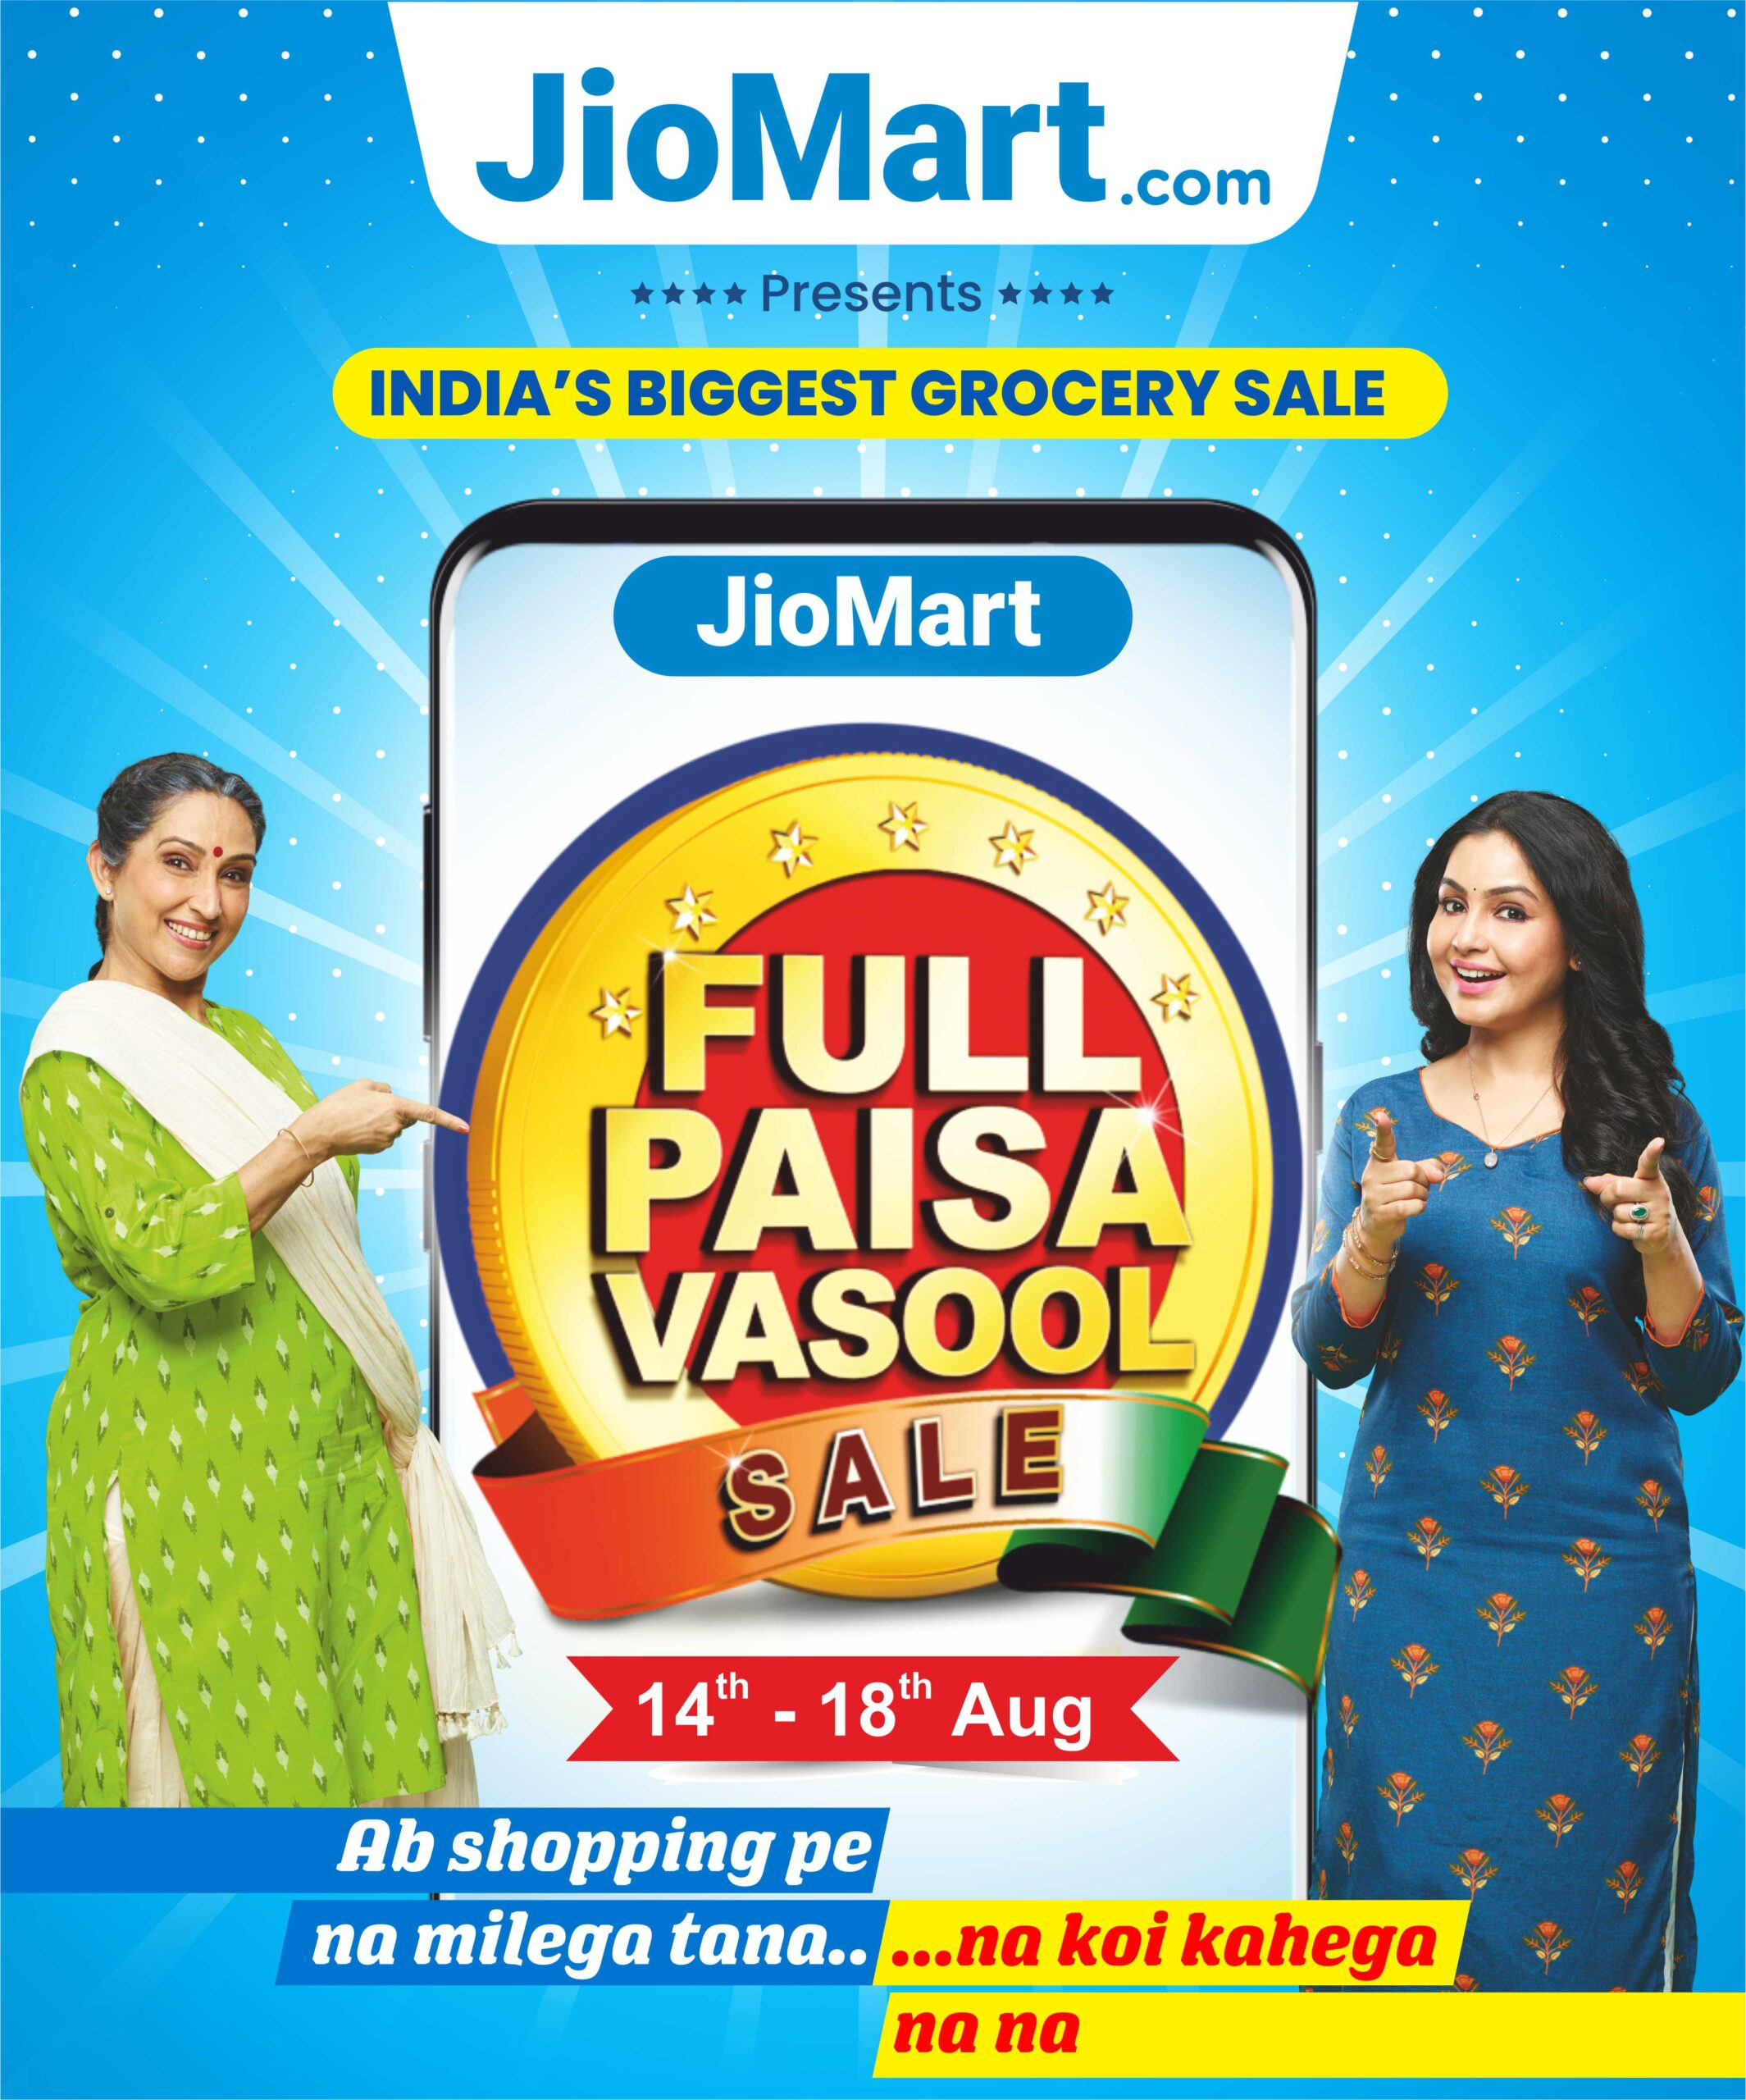 JioMart and Smart SuperStore presents Full Paisa Vasool Sale